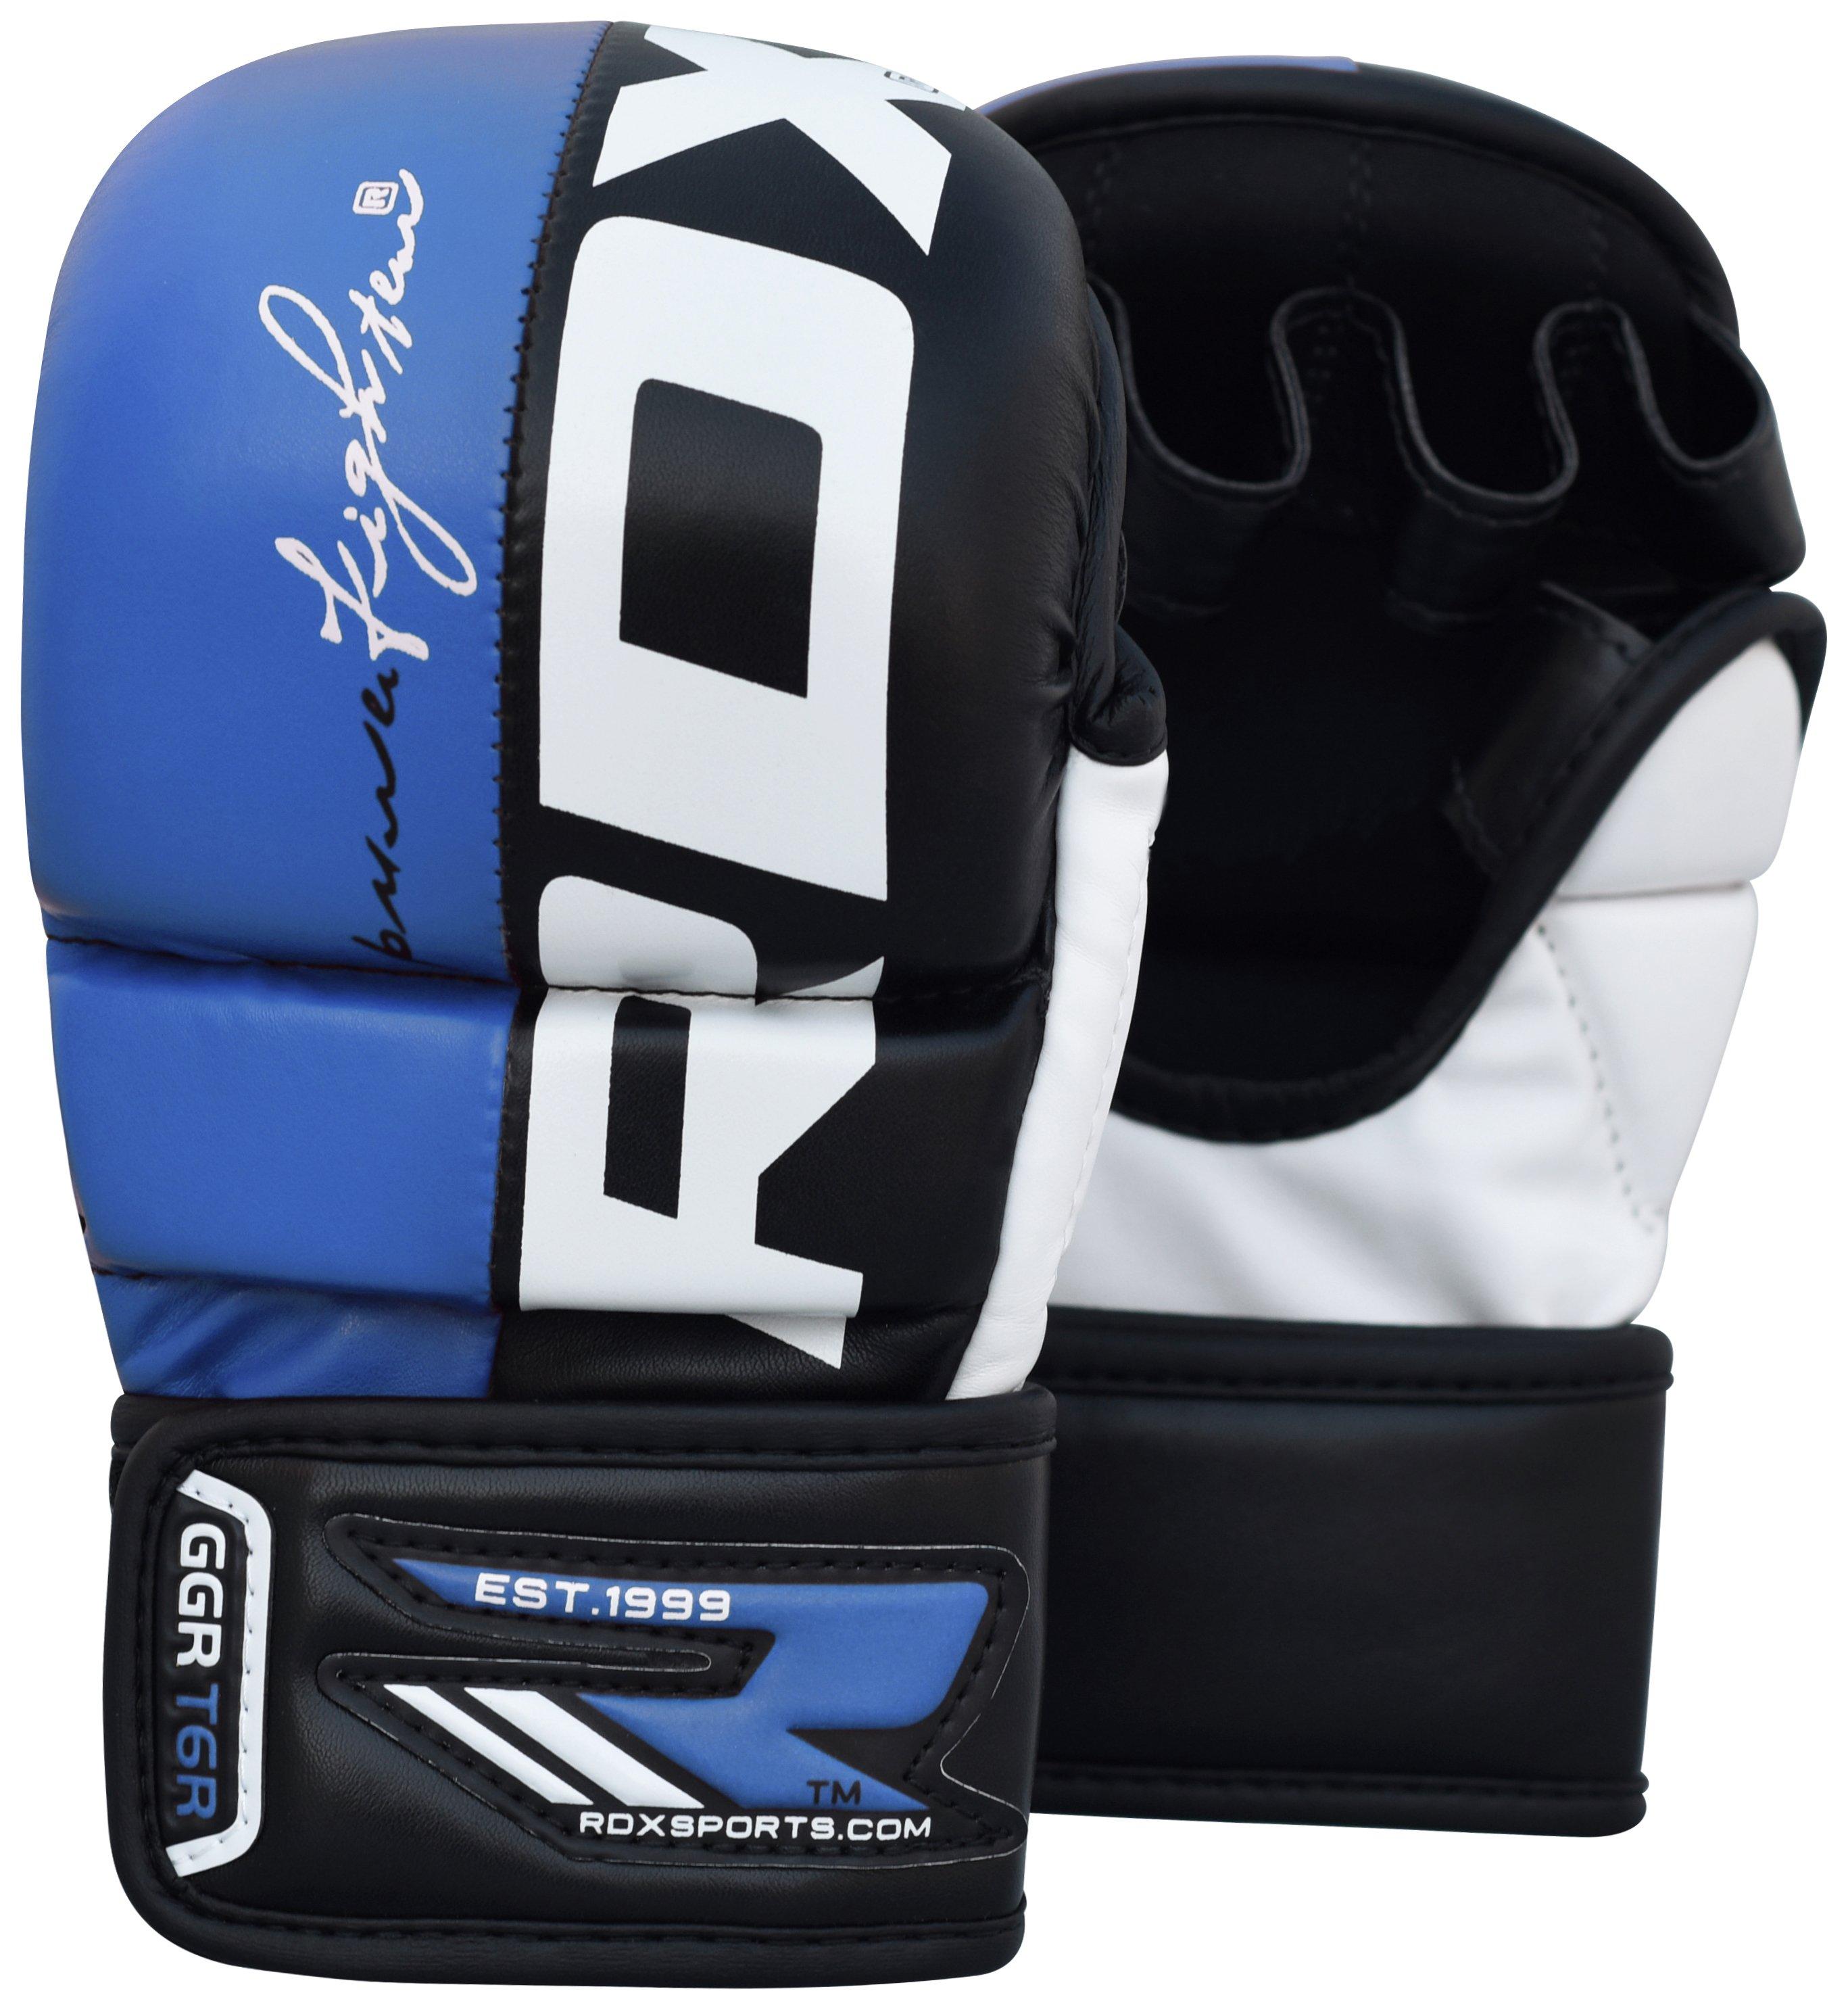 RDX Medium to Large Mixed Martial Arts Training Gloves -Blue